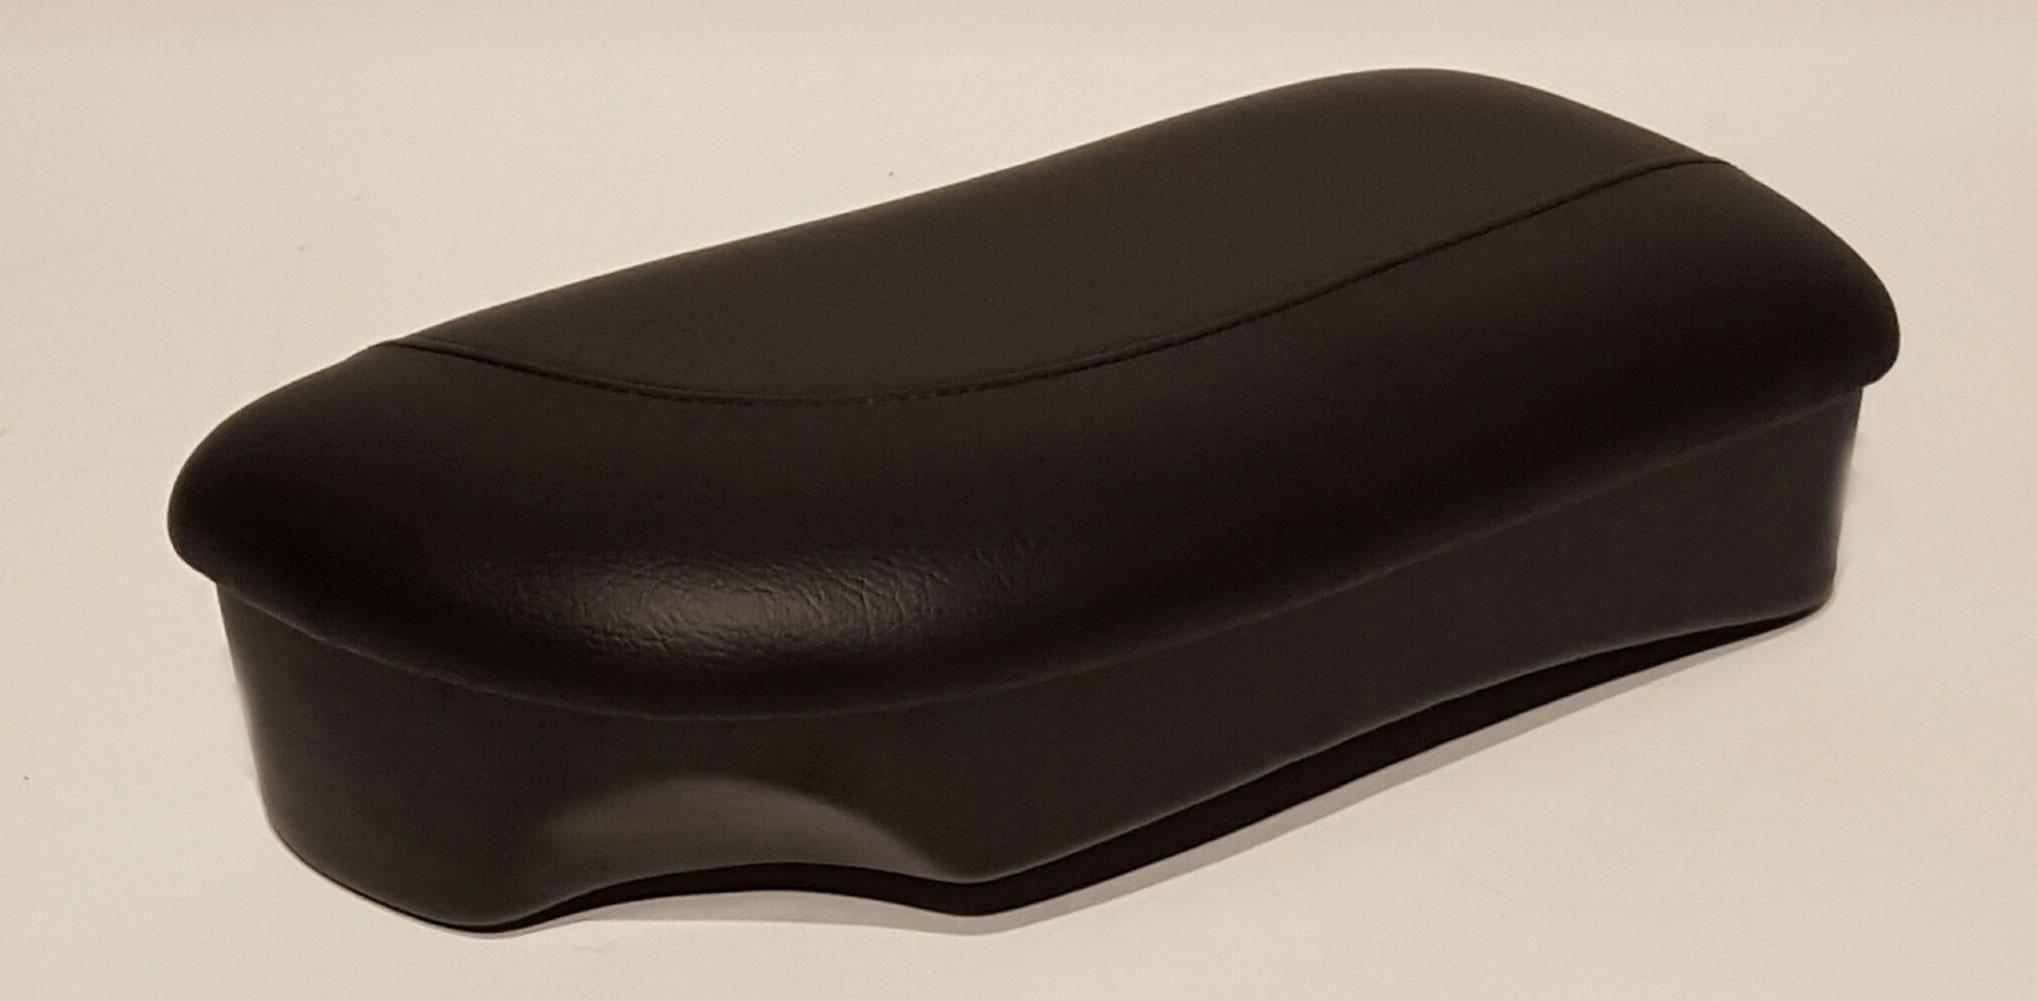 Seat Altea + XL Armlæn Komplet Midterarmlæn Kunstlæder